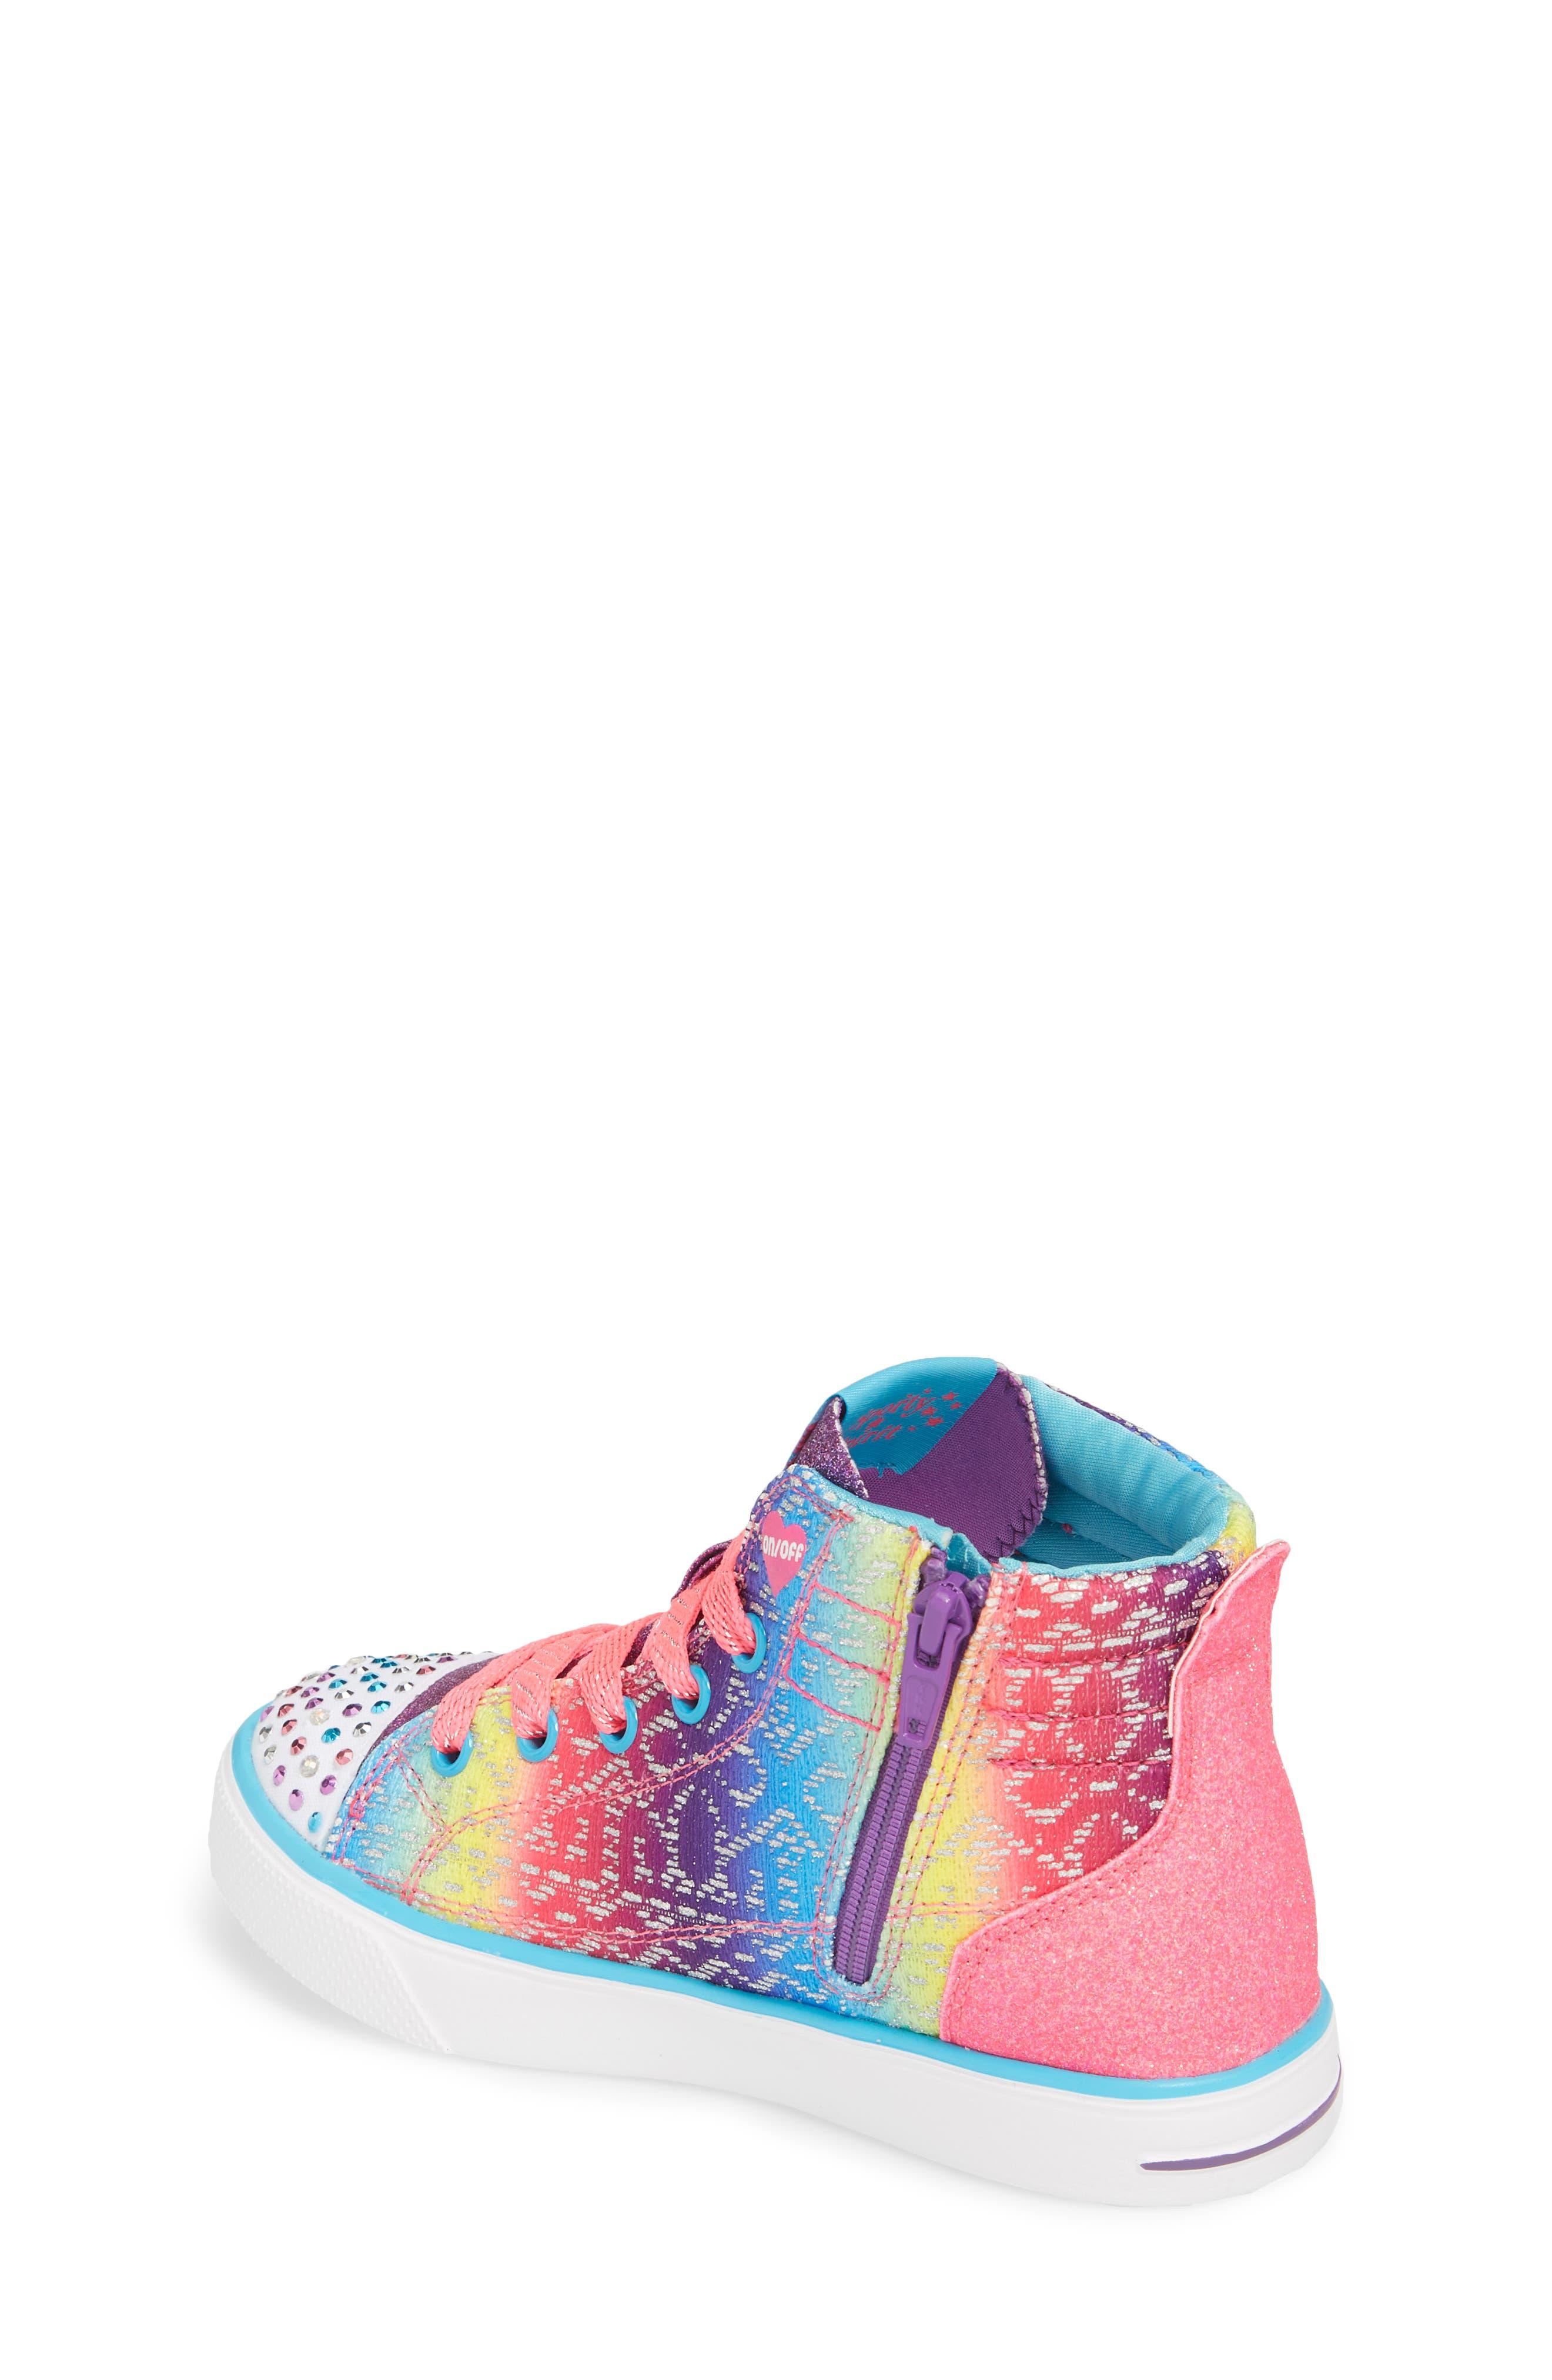 Alternate Image 2  - SKECHERS Twinkle Toes Breeze 2.0 Light-Up High Top Sneaker (Toddler, Little Kid & Big Kid)